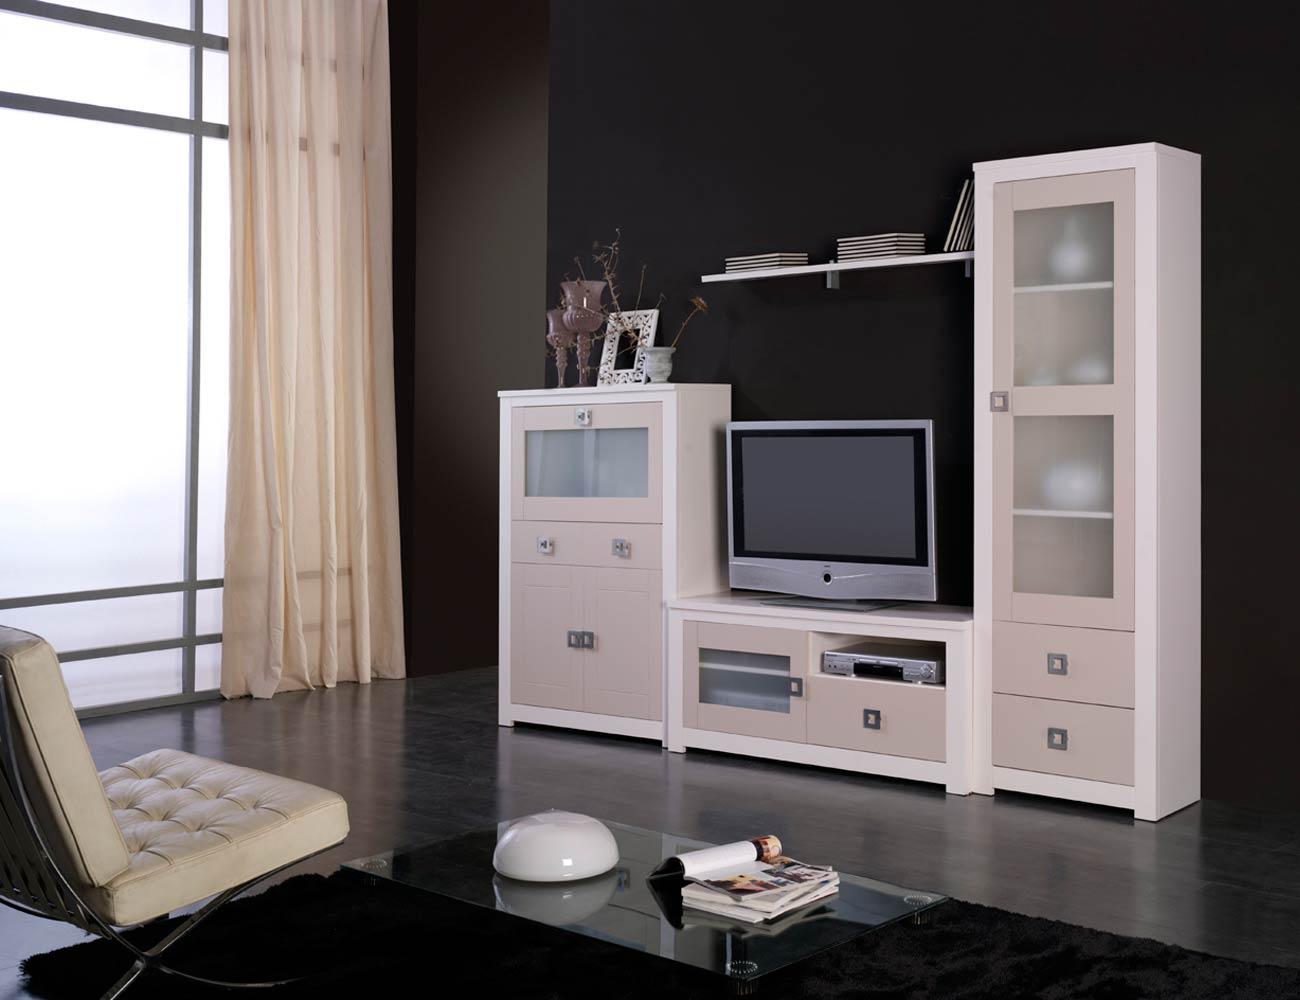 Mueble salon modular lacado blanco piedra madera dm